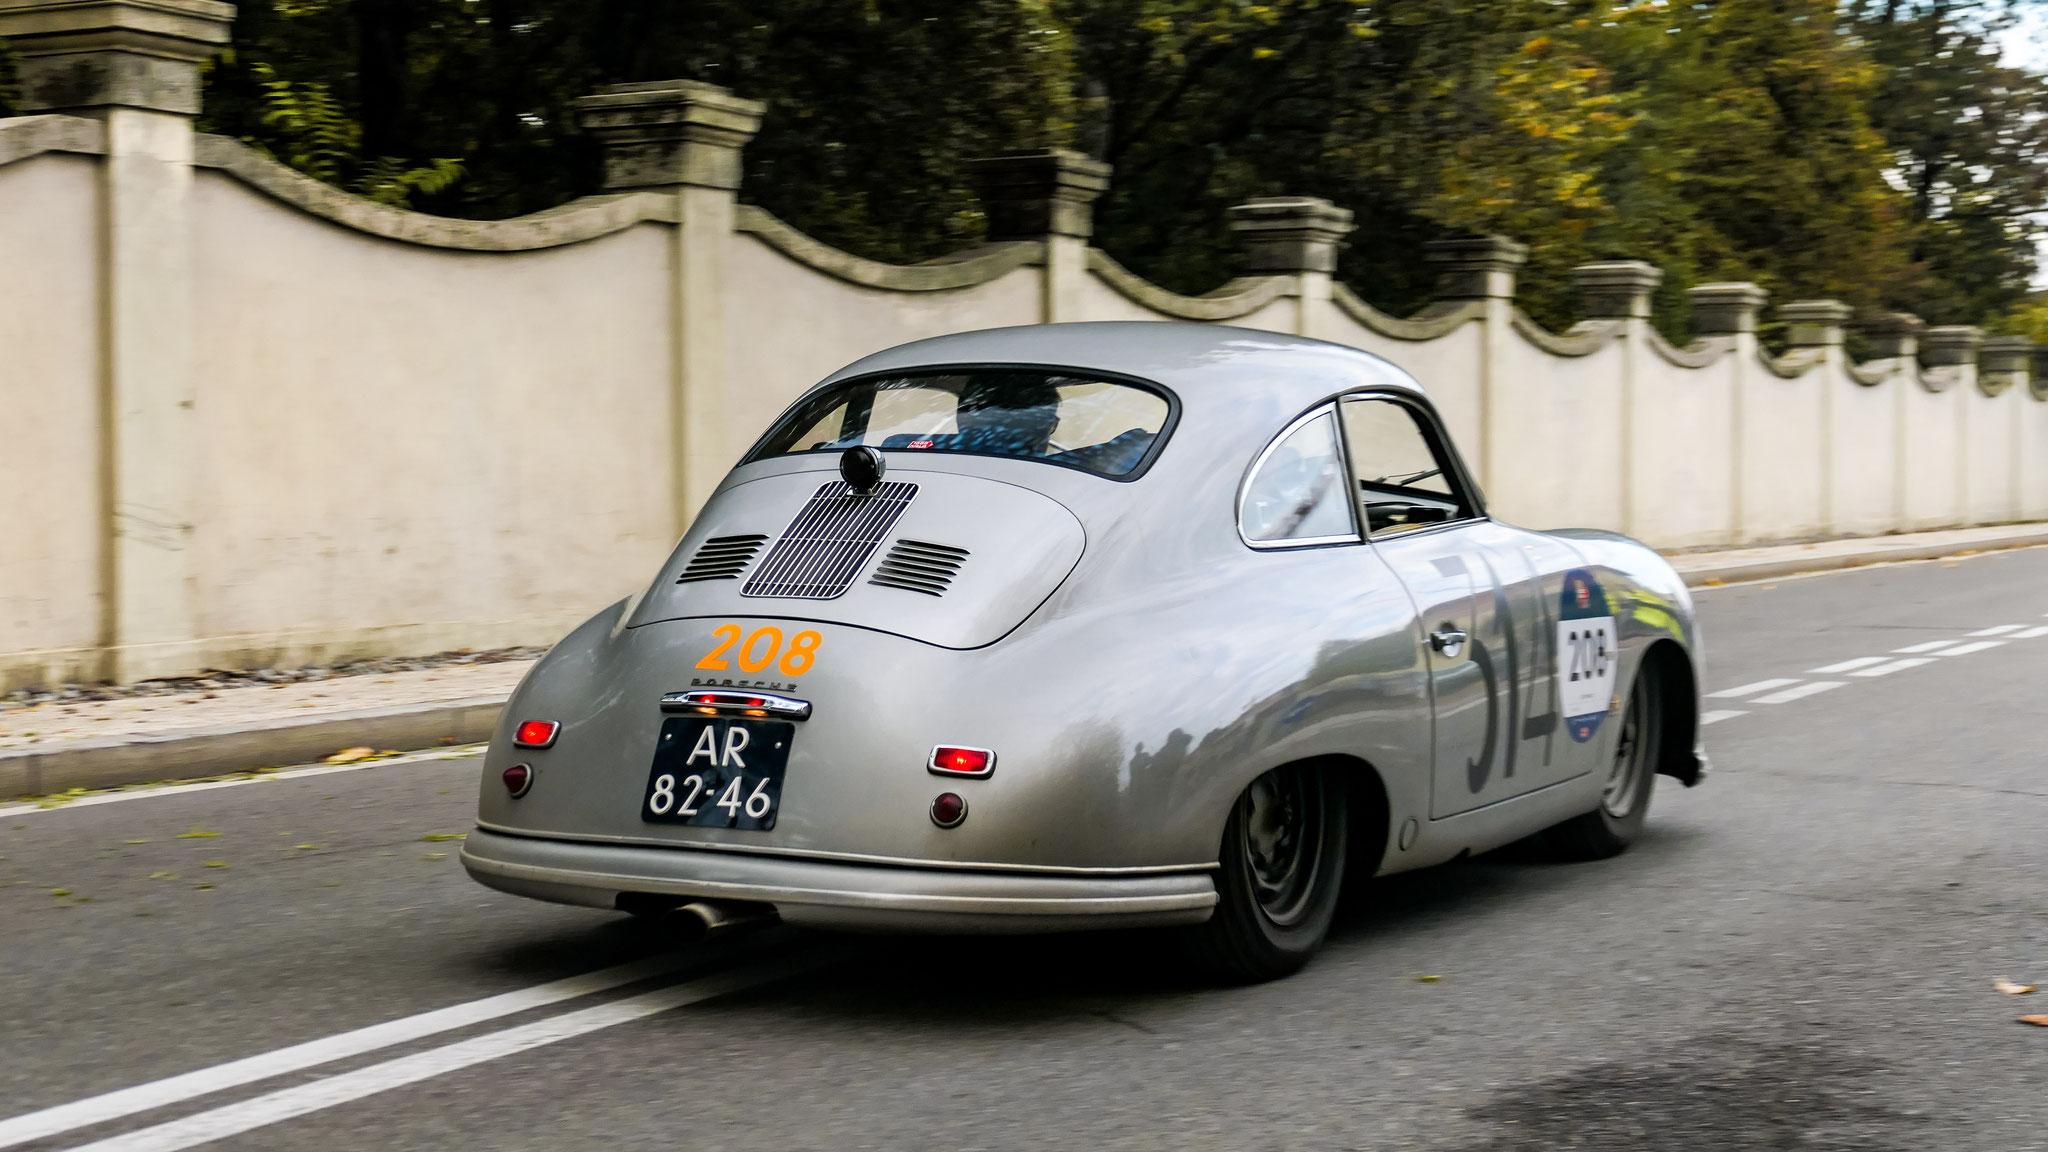 Porsche 356 1500 - AR-82-46 (NL)